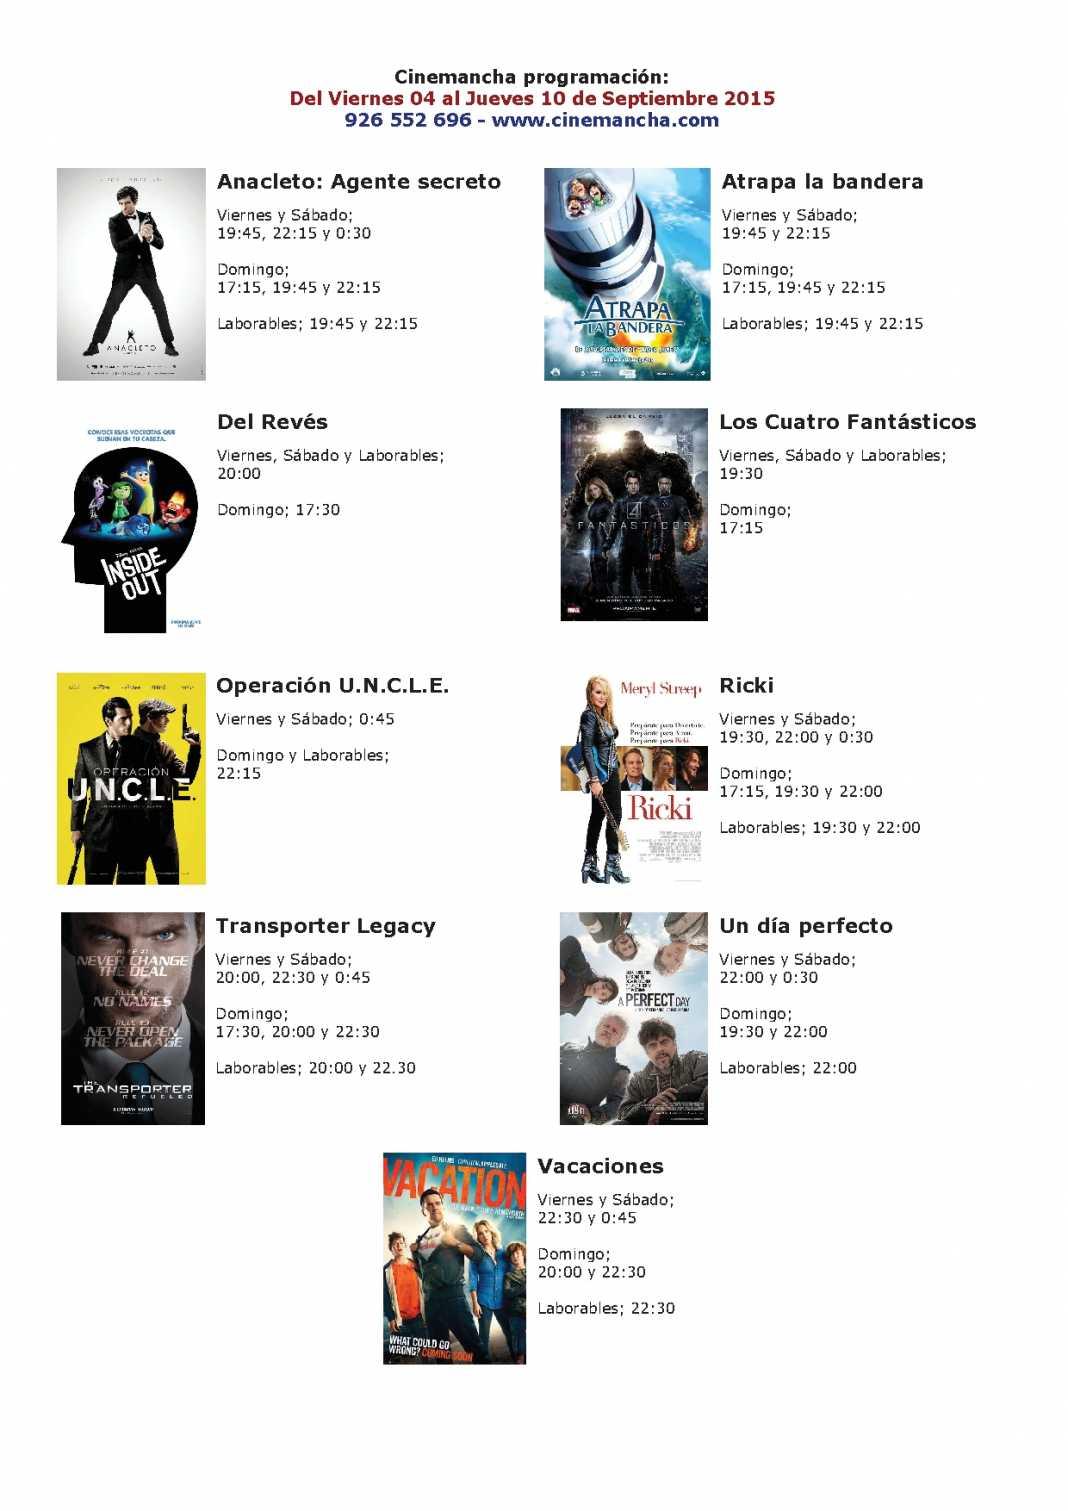 cartelera de cinemancha del 04 al 10 de septiembre 1 1068x1511 - Cartelera Cinemancha del 04 al 10 de septiembre